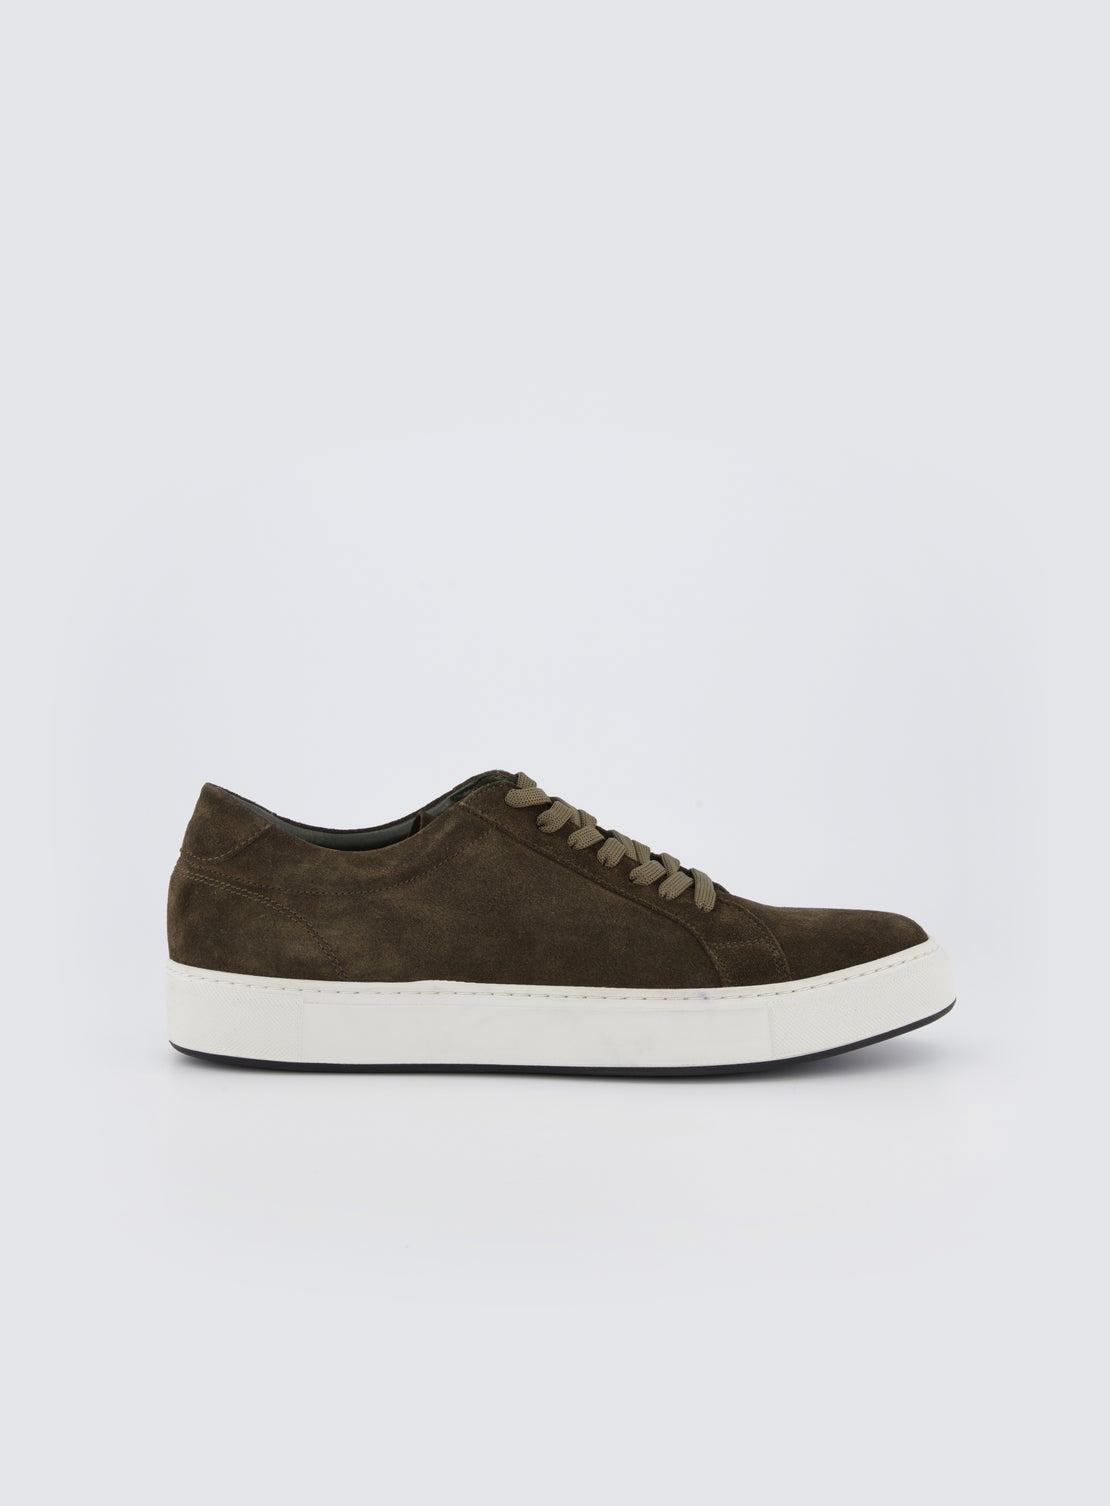 Coltrane Olive Suede Sneaker